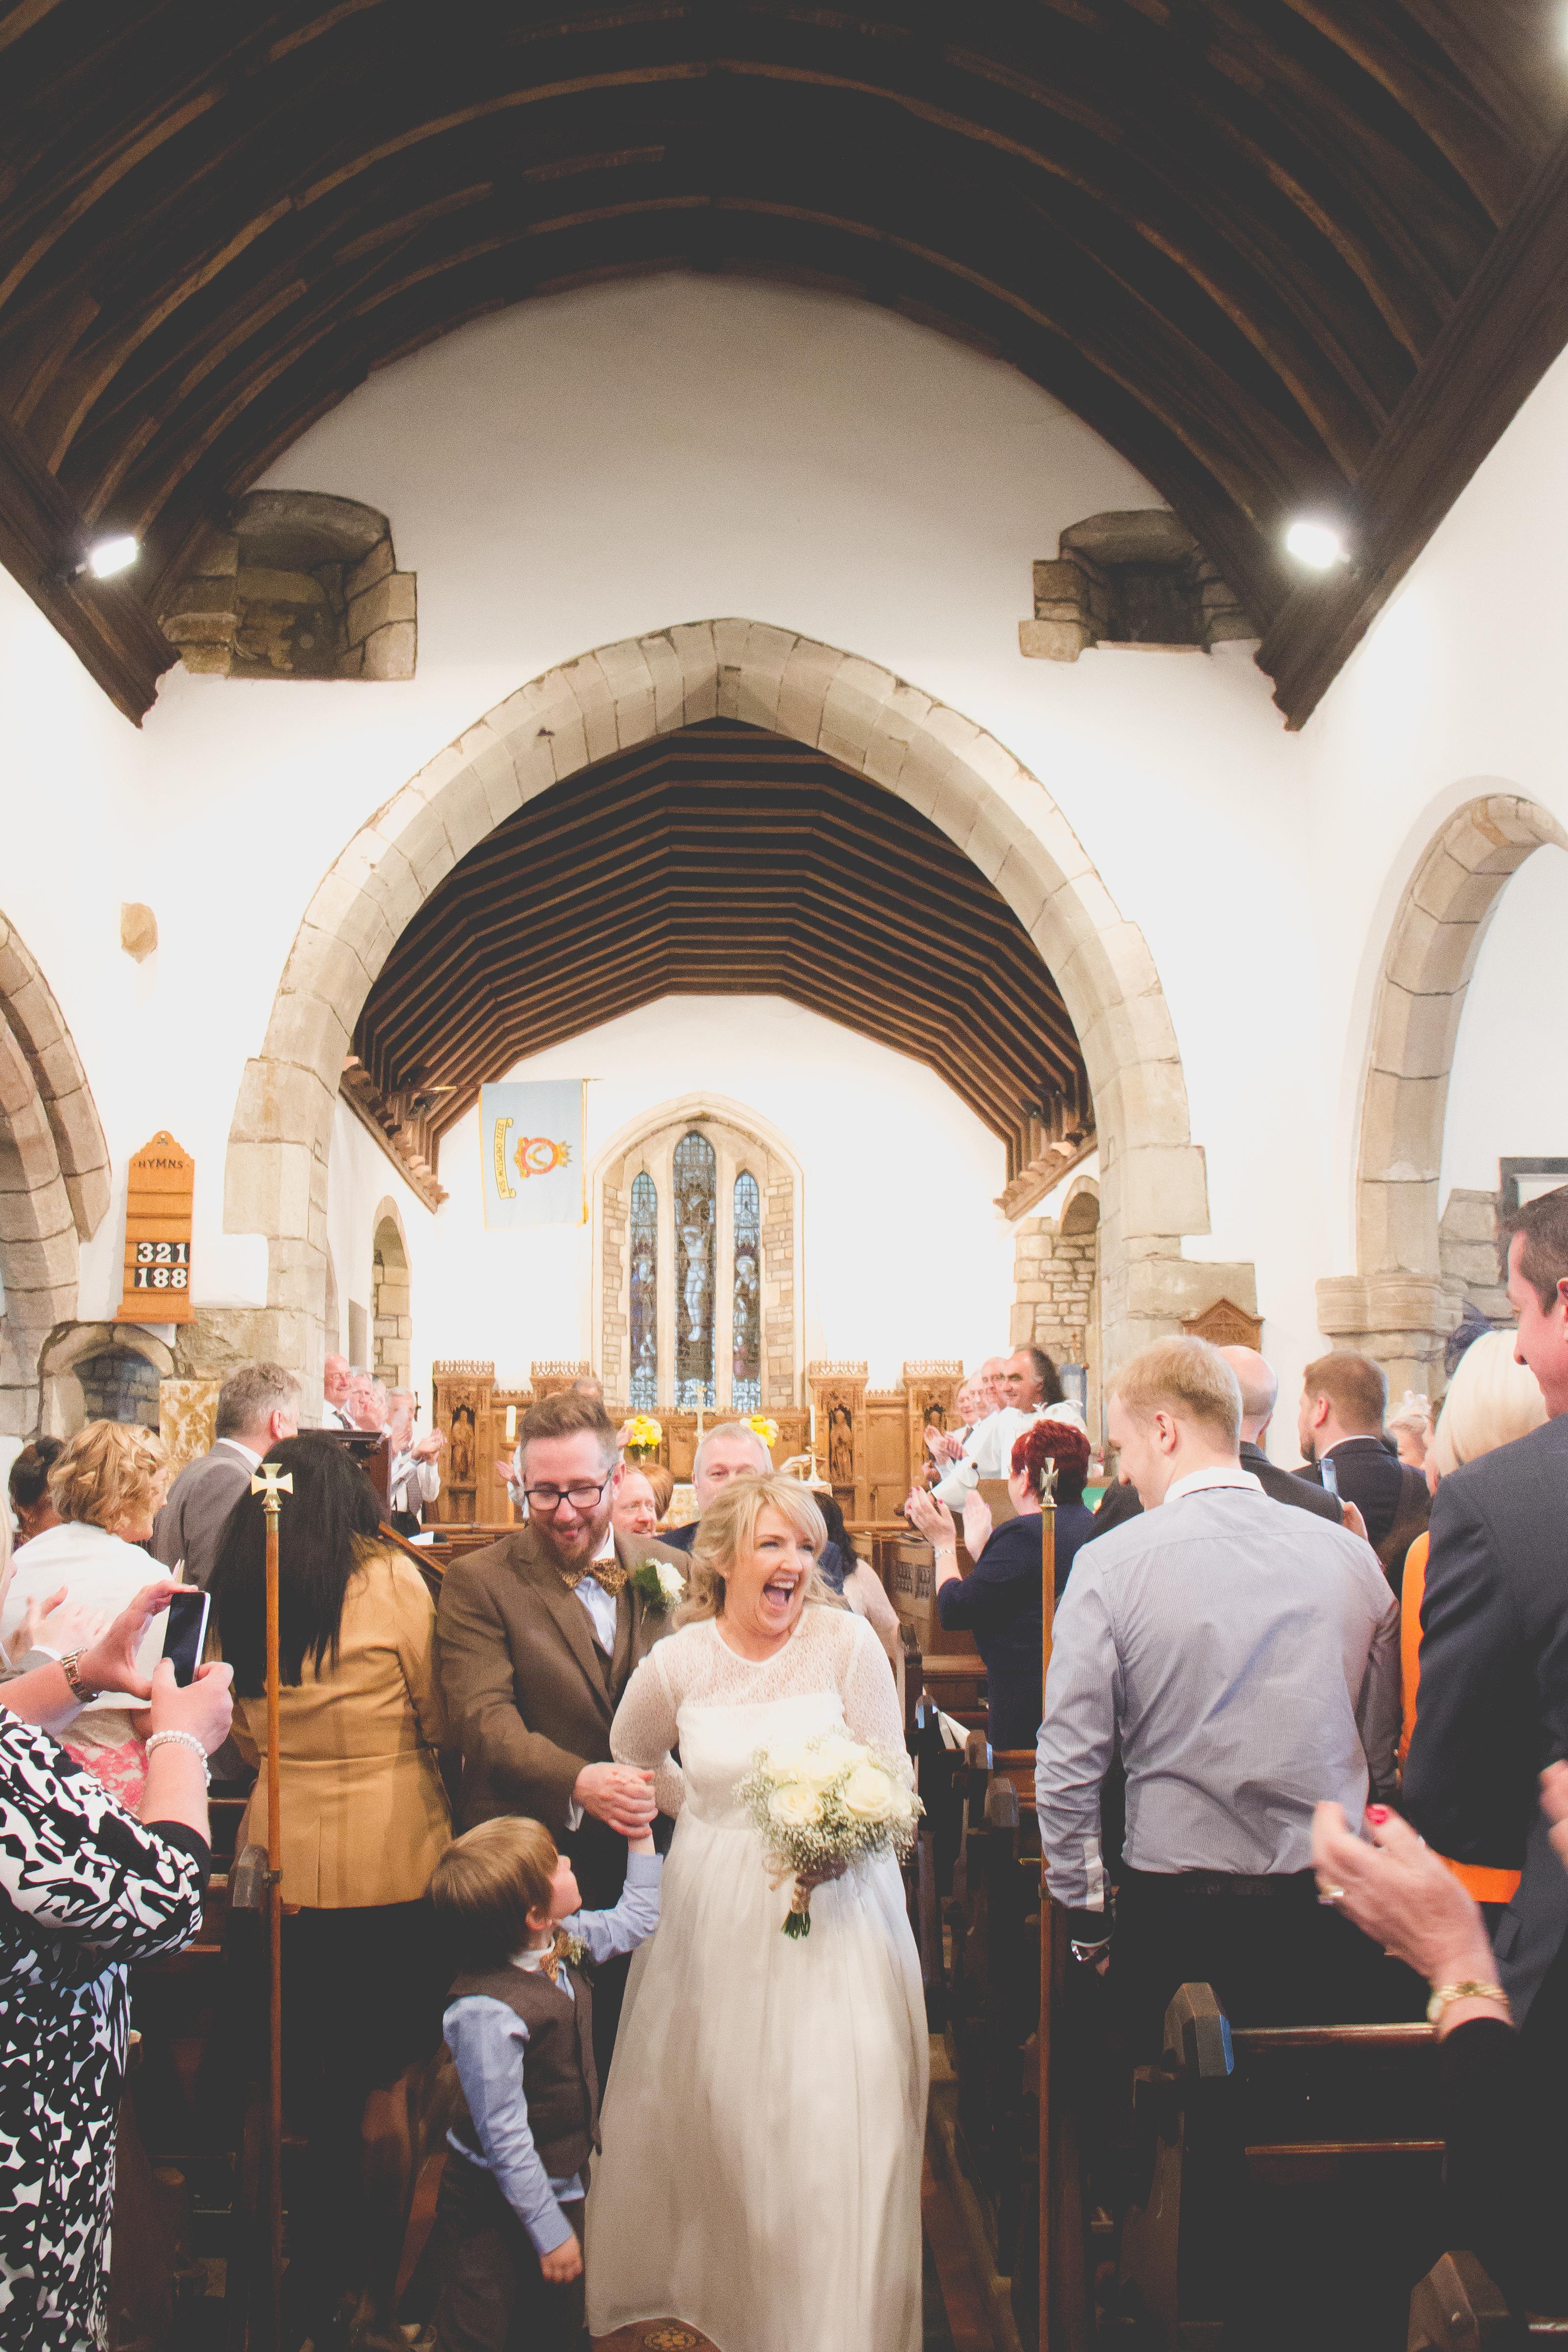 Mathern church wedding